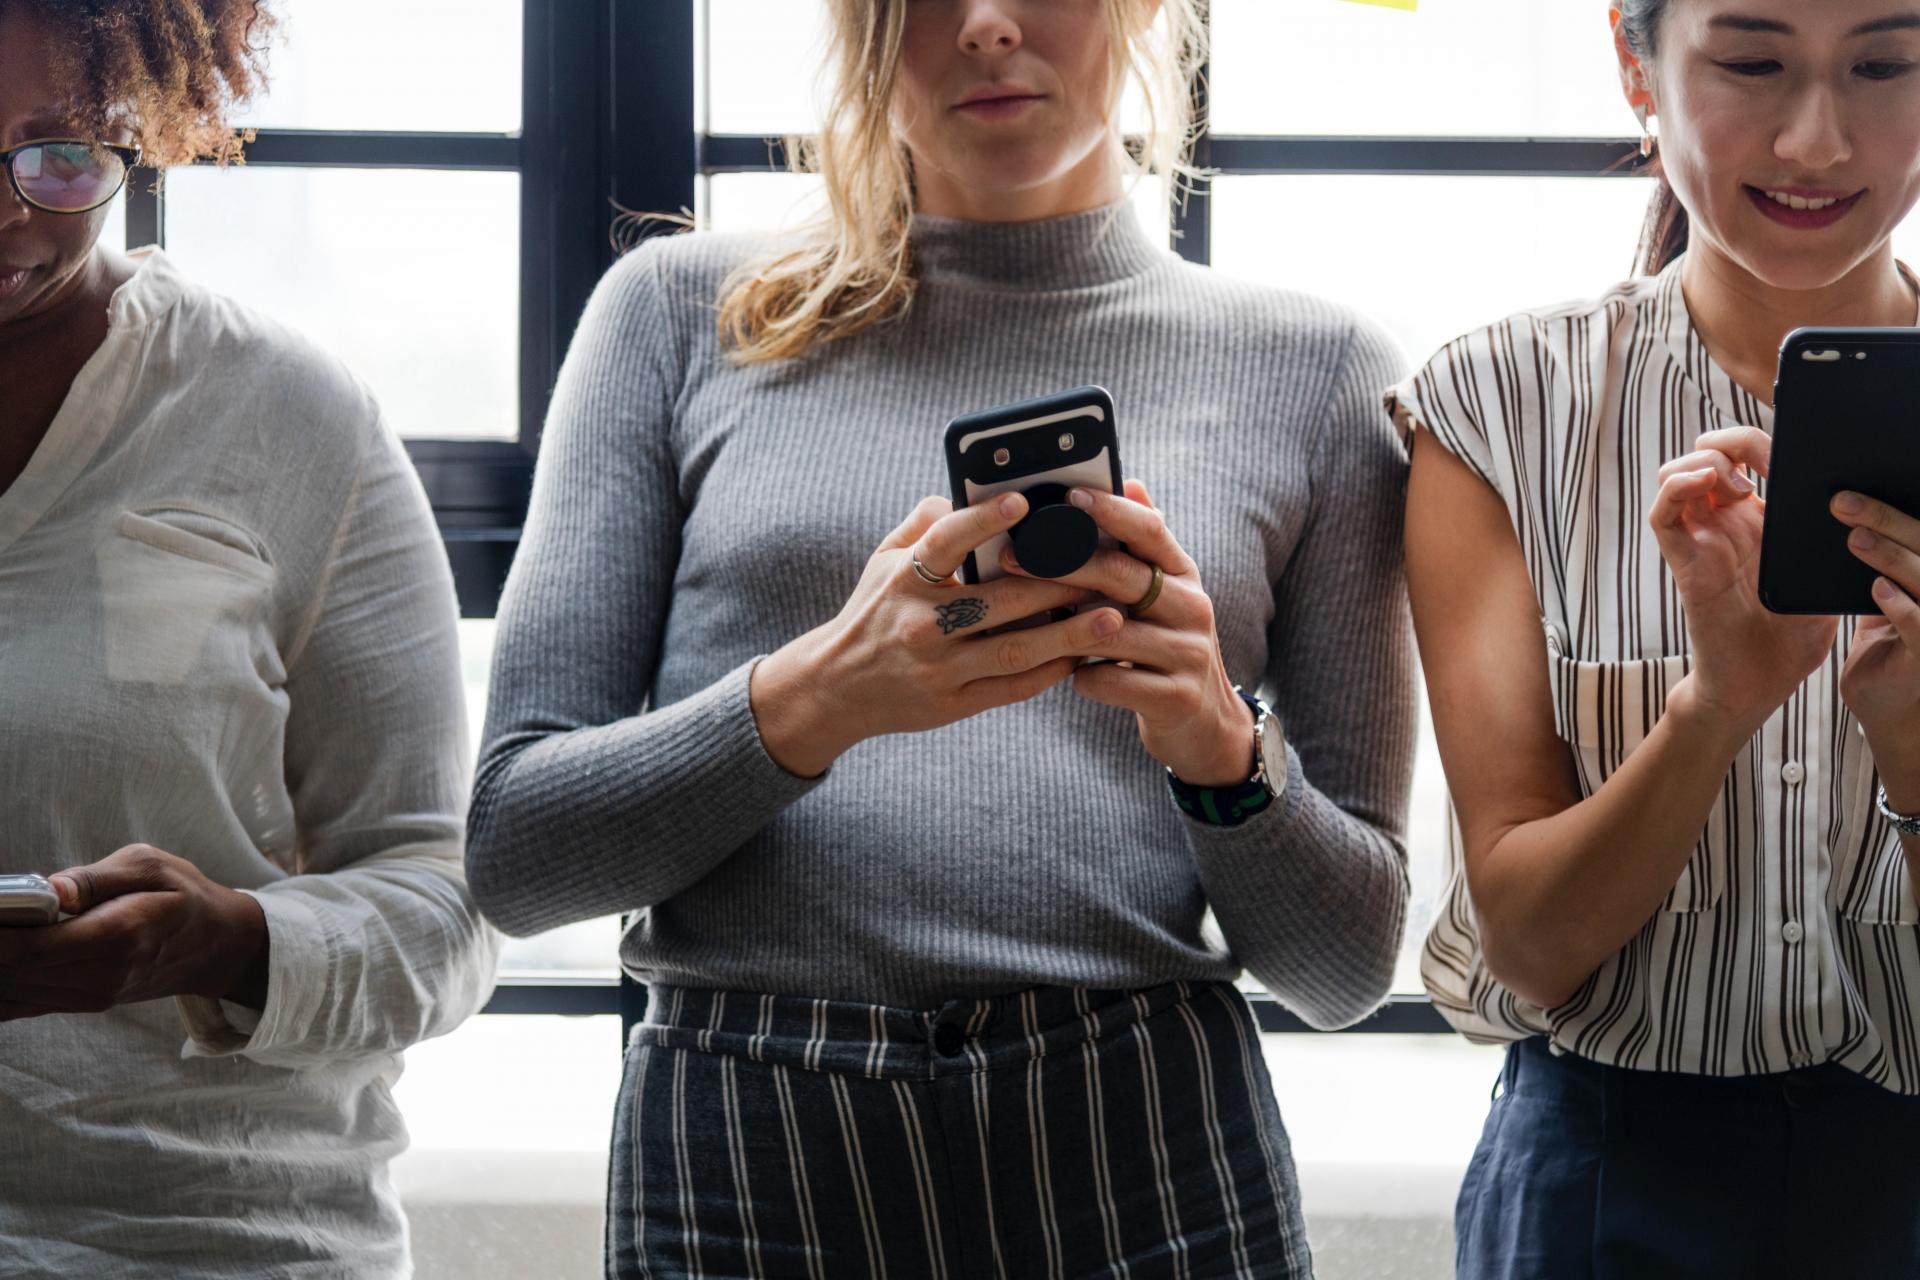 social media mental health study